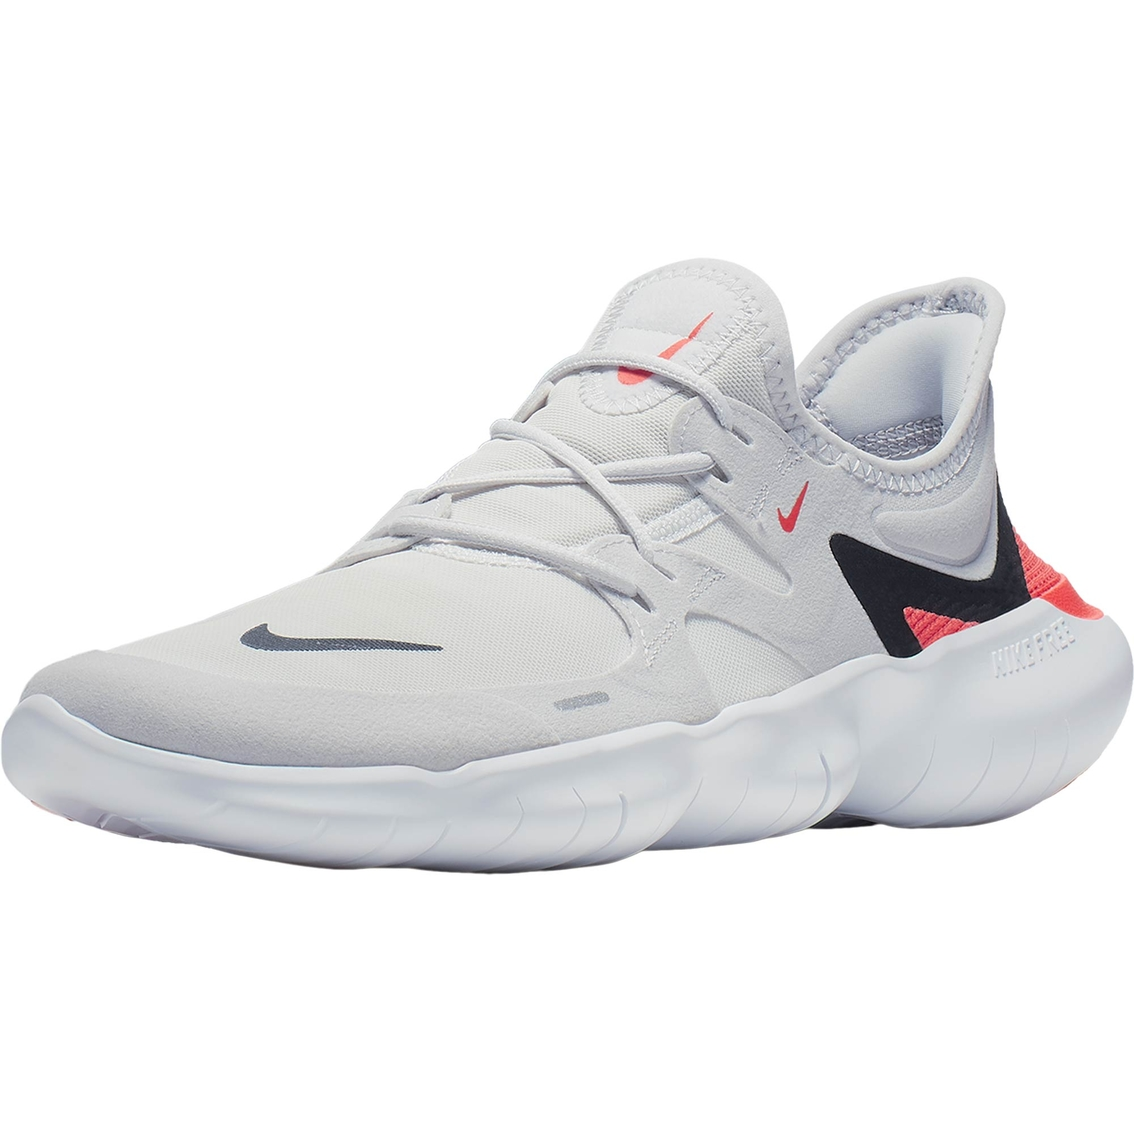 buy popular a191e 5d51a Nike Men's Free Rn 5.0 Running Shoes | Running | Shoes ...